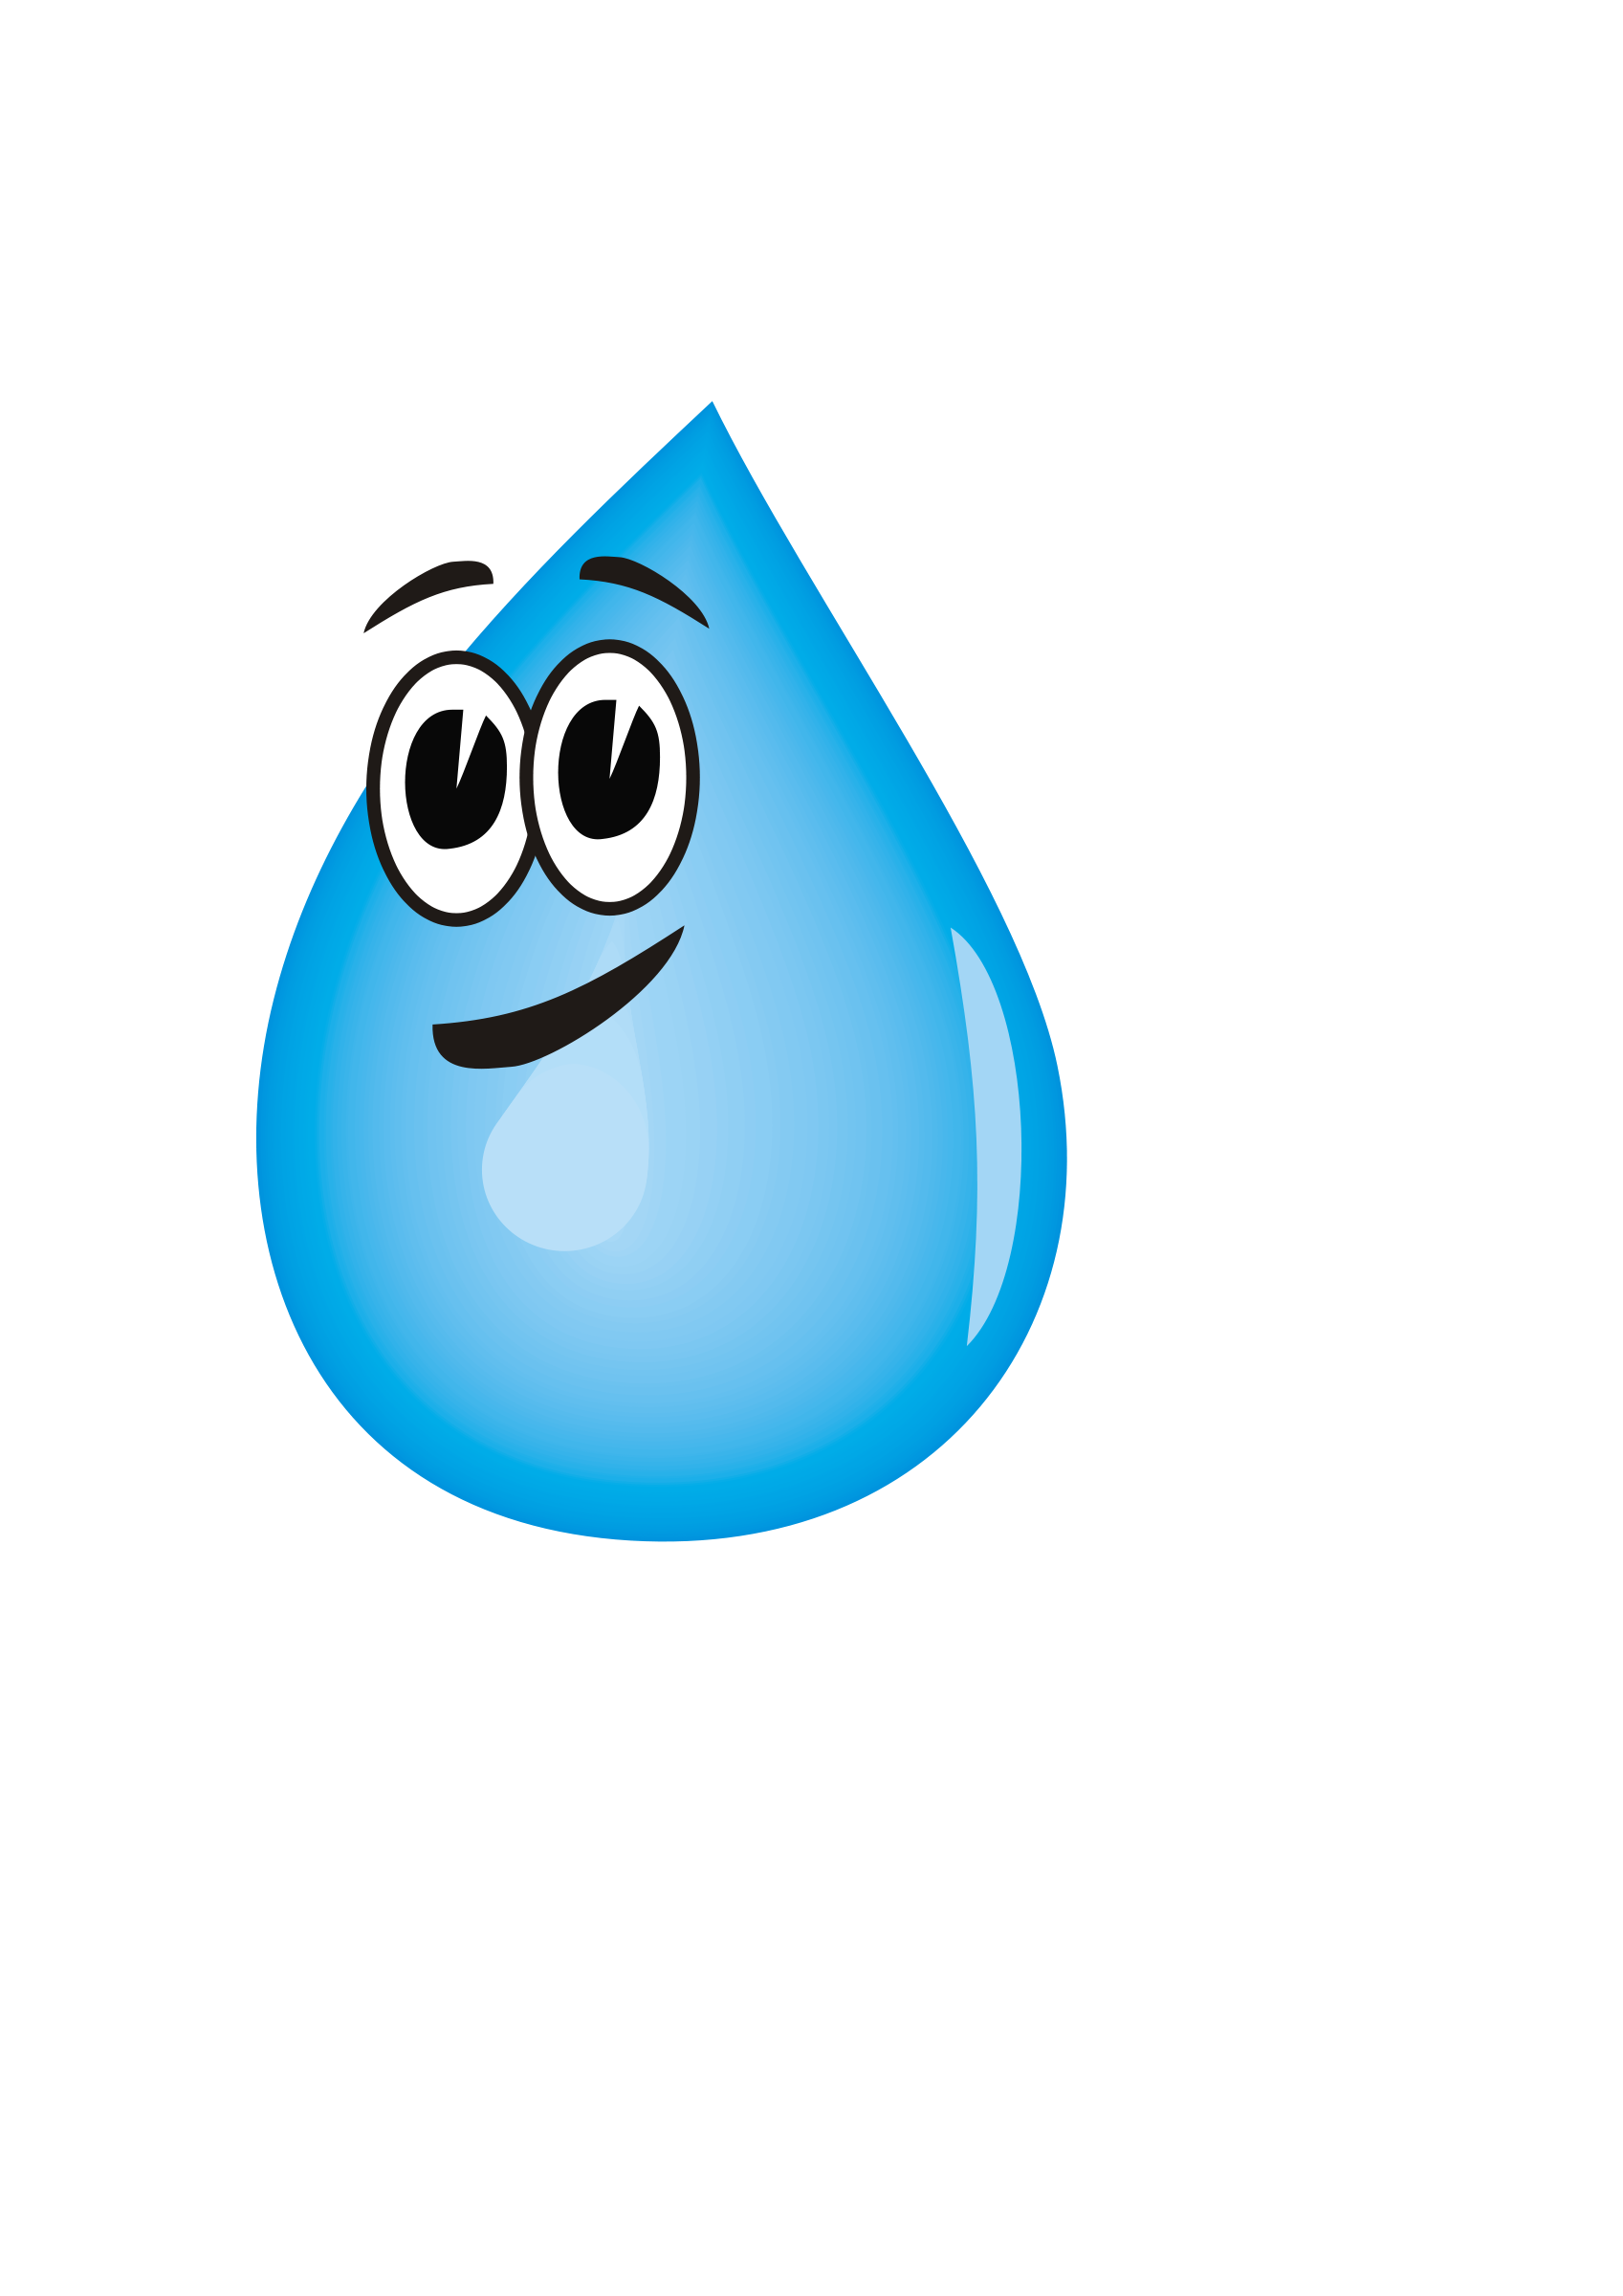 Water Drop clipart #2, Download drawings